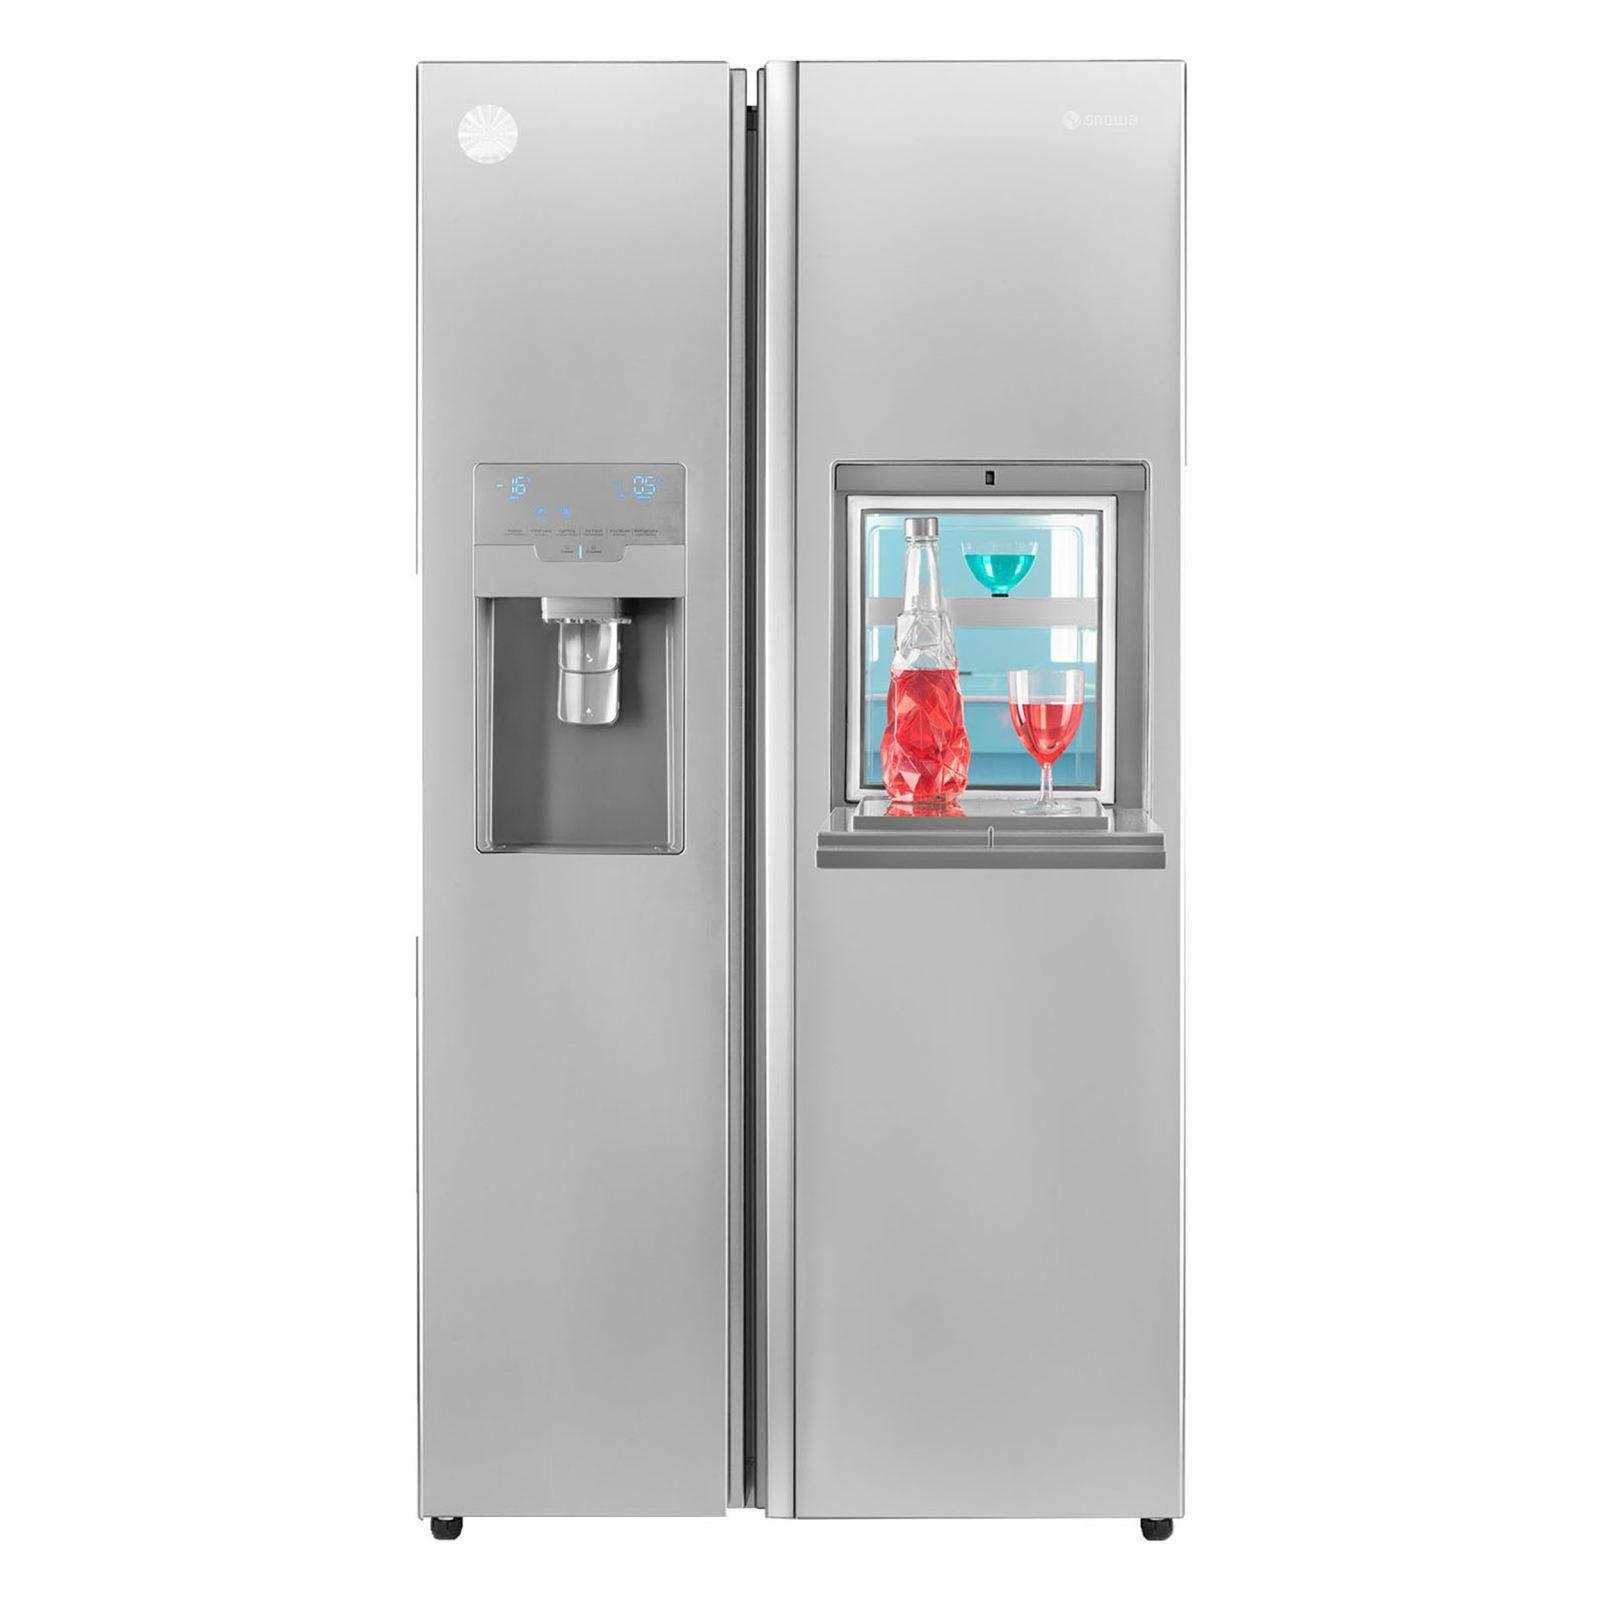 Snowa S8 2352 Side By Side Refrigerator dominokala 2 - ساید بای ساید اسنوا S8-2352